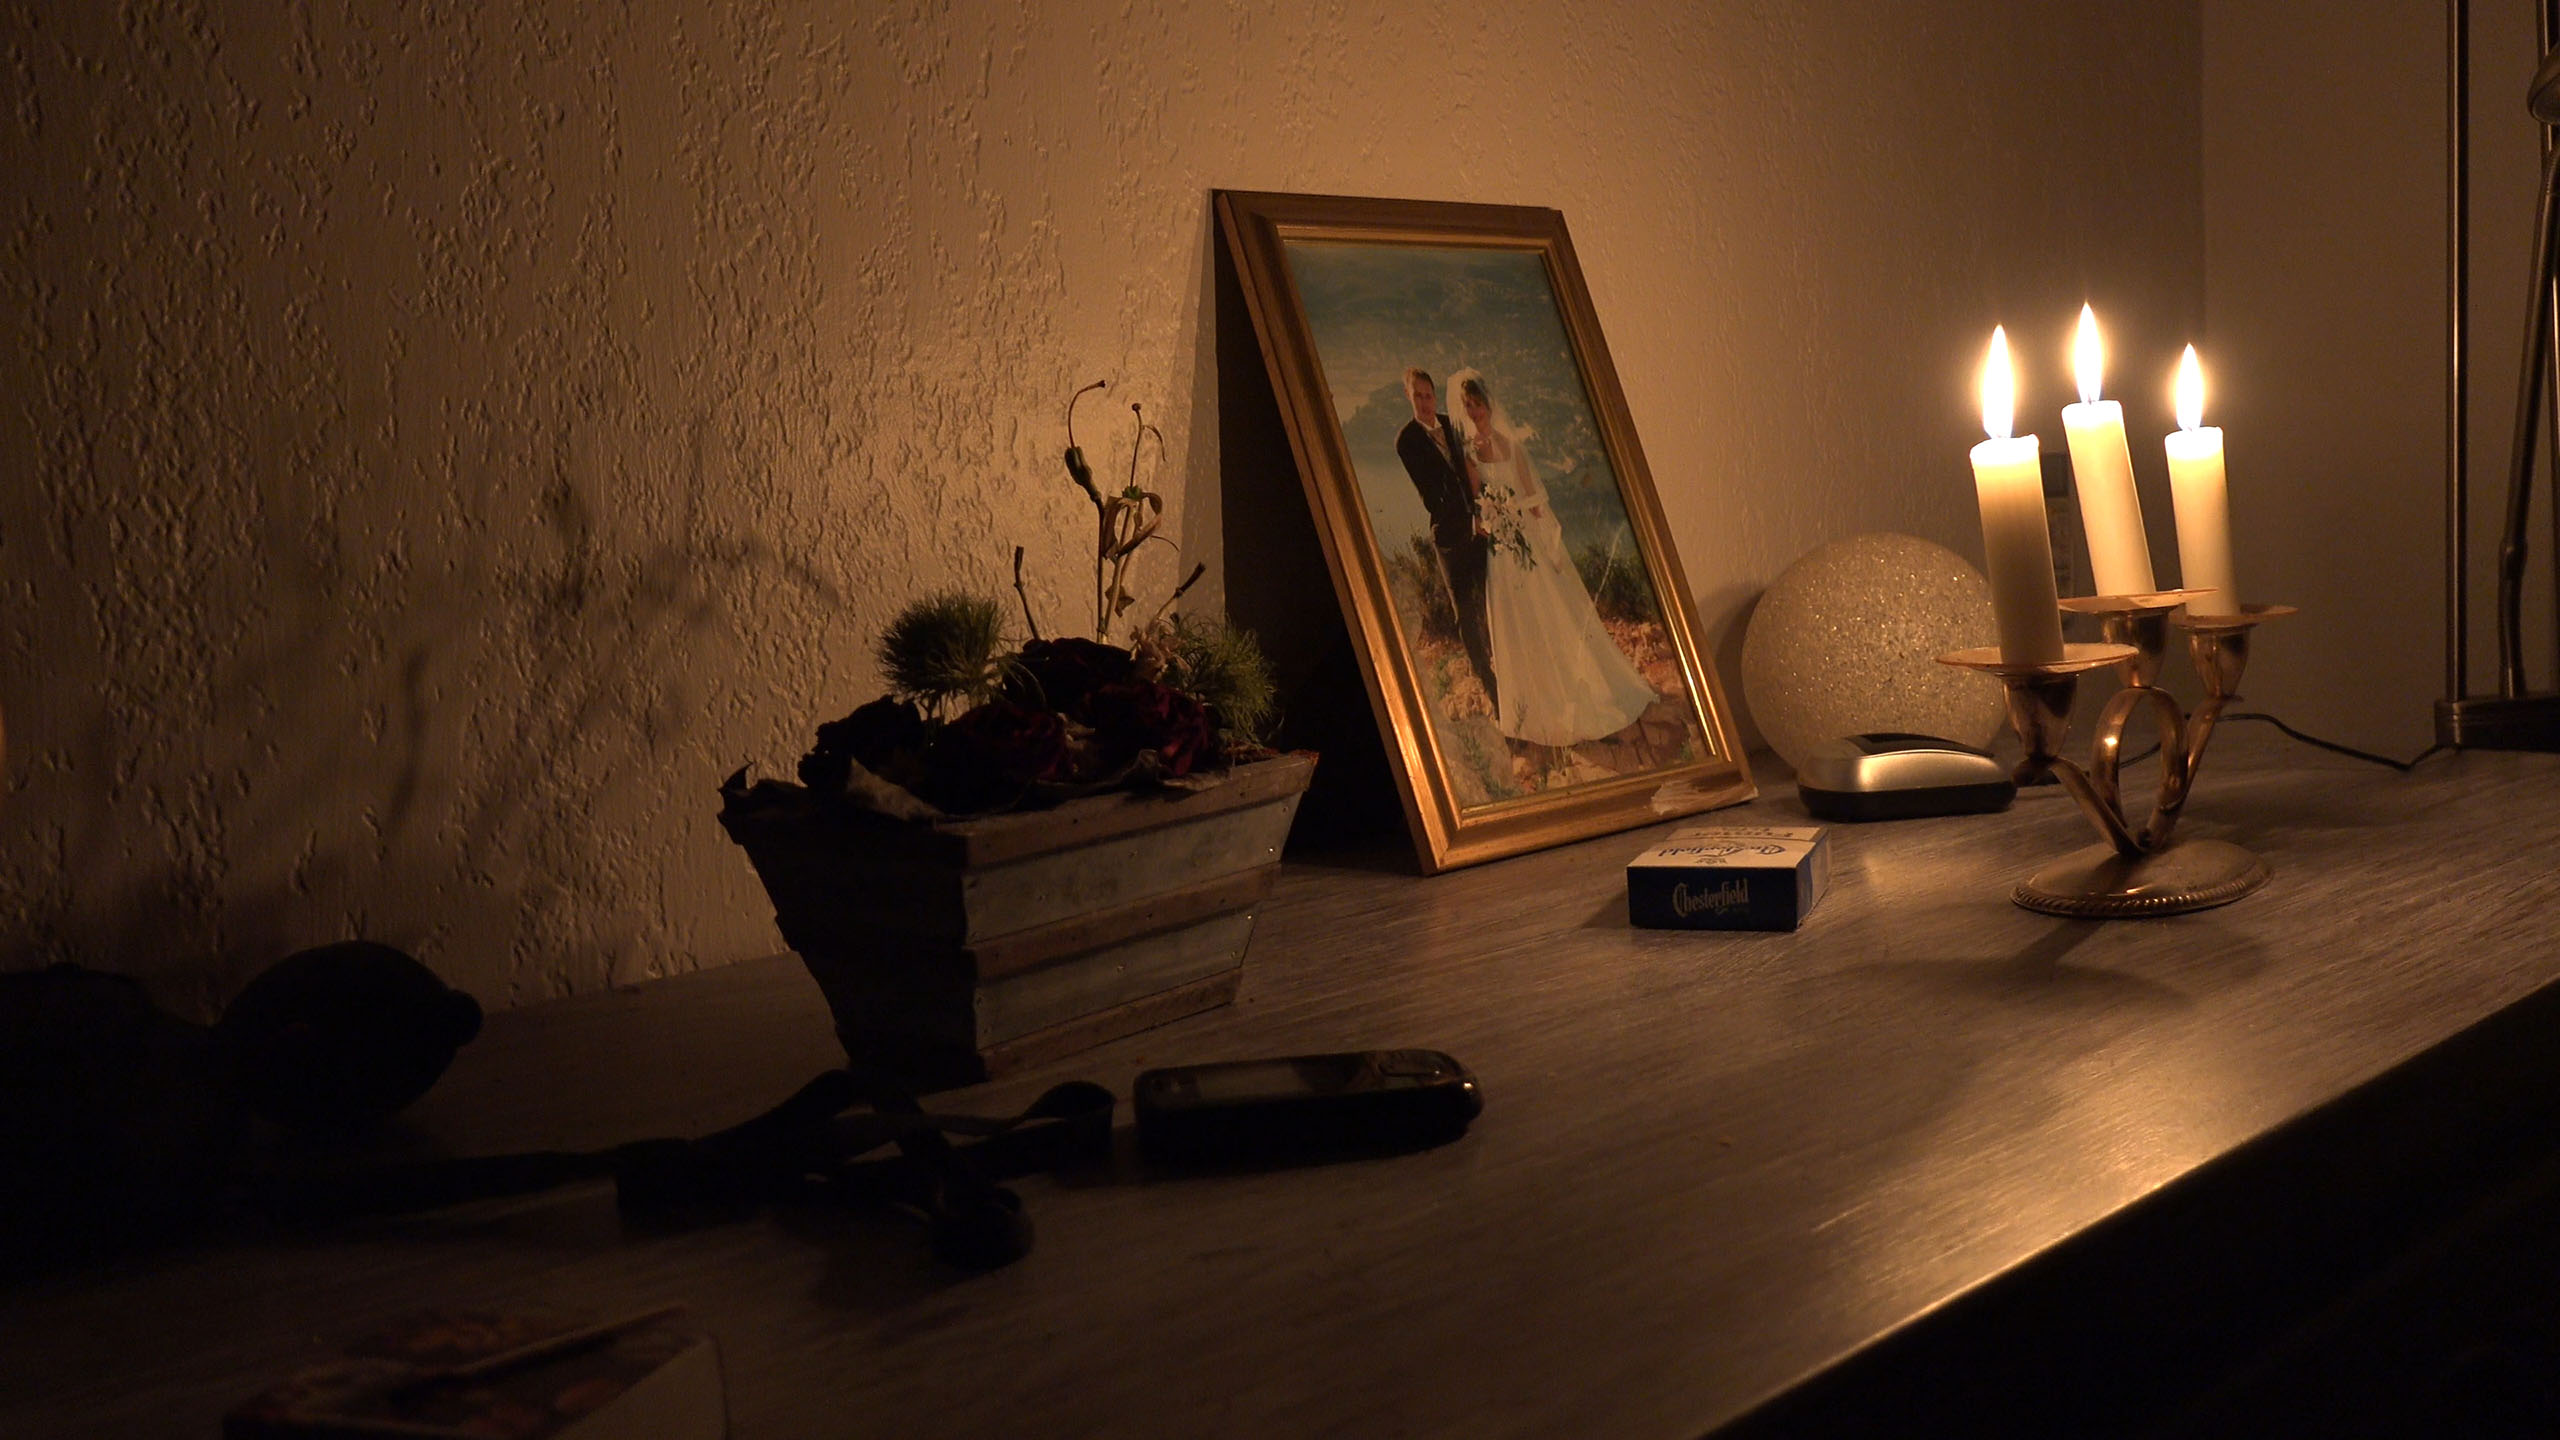 bougies 1440.jpg